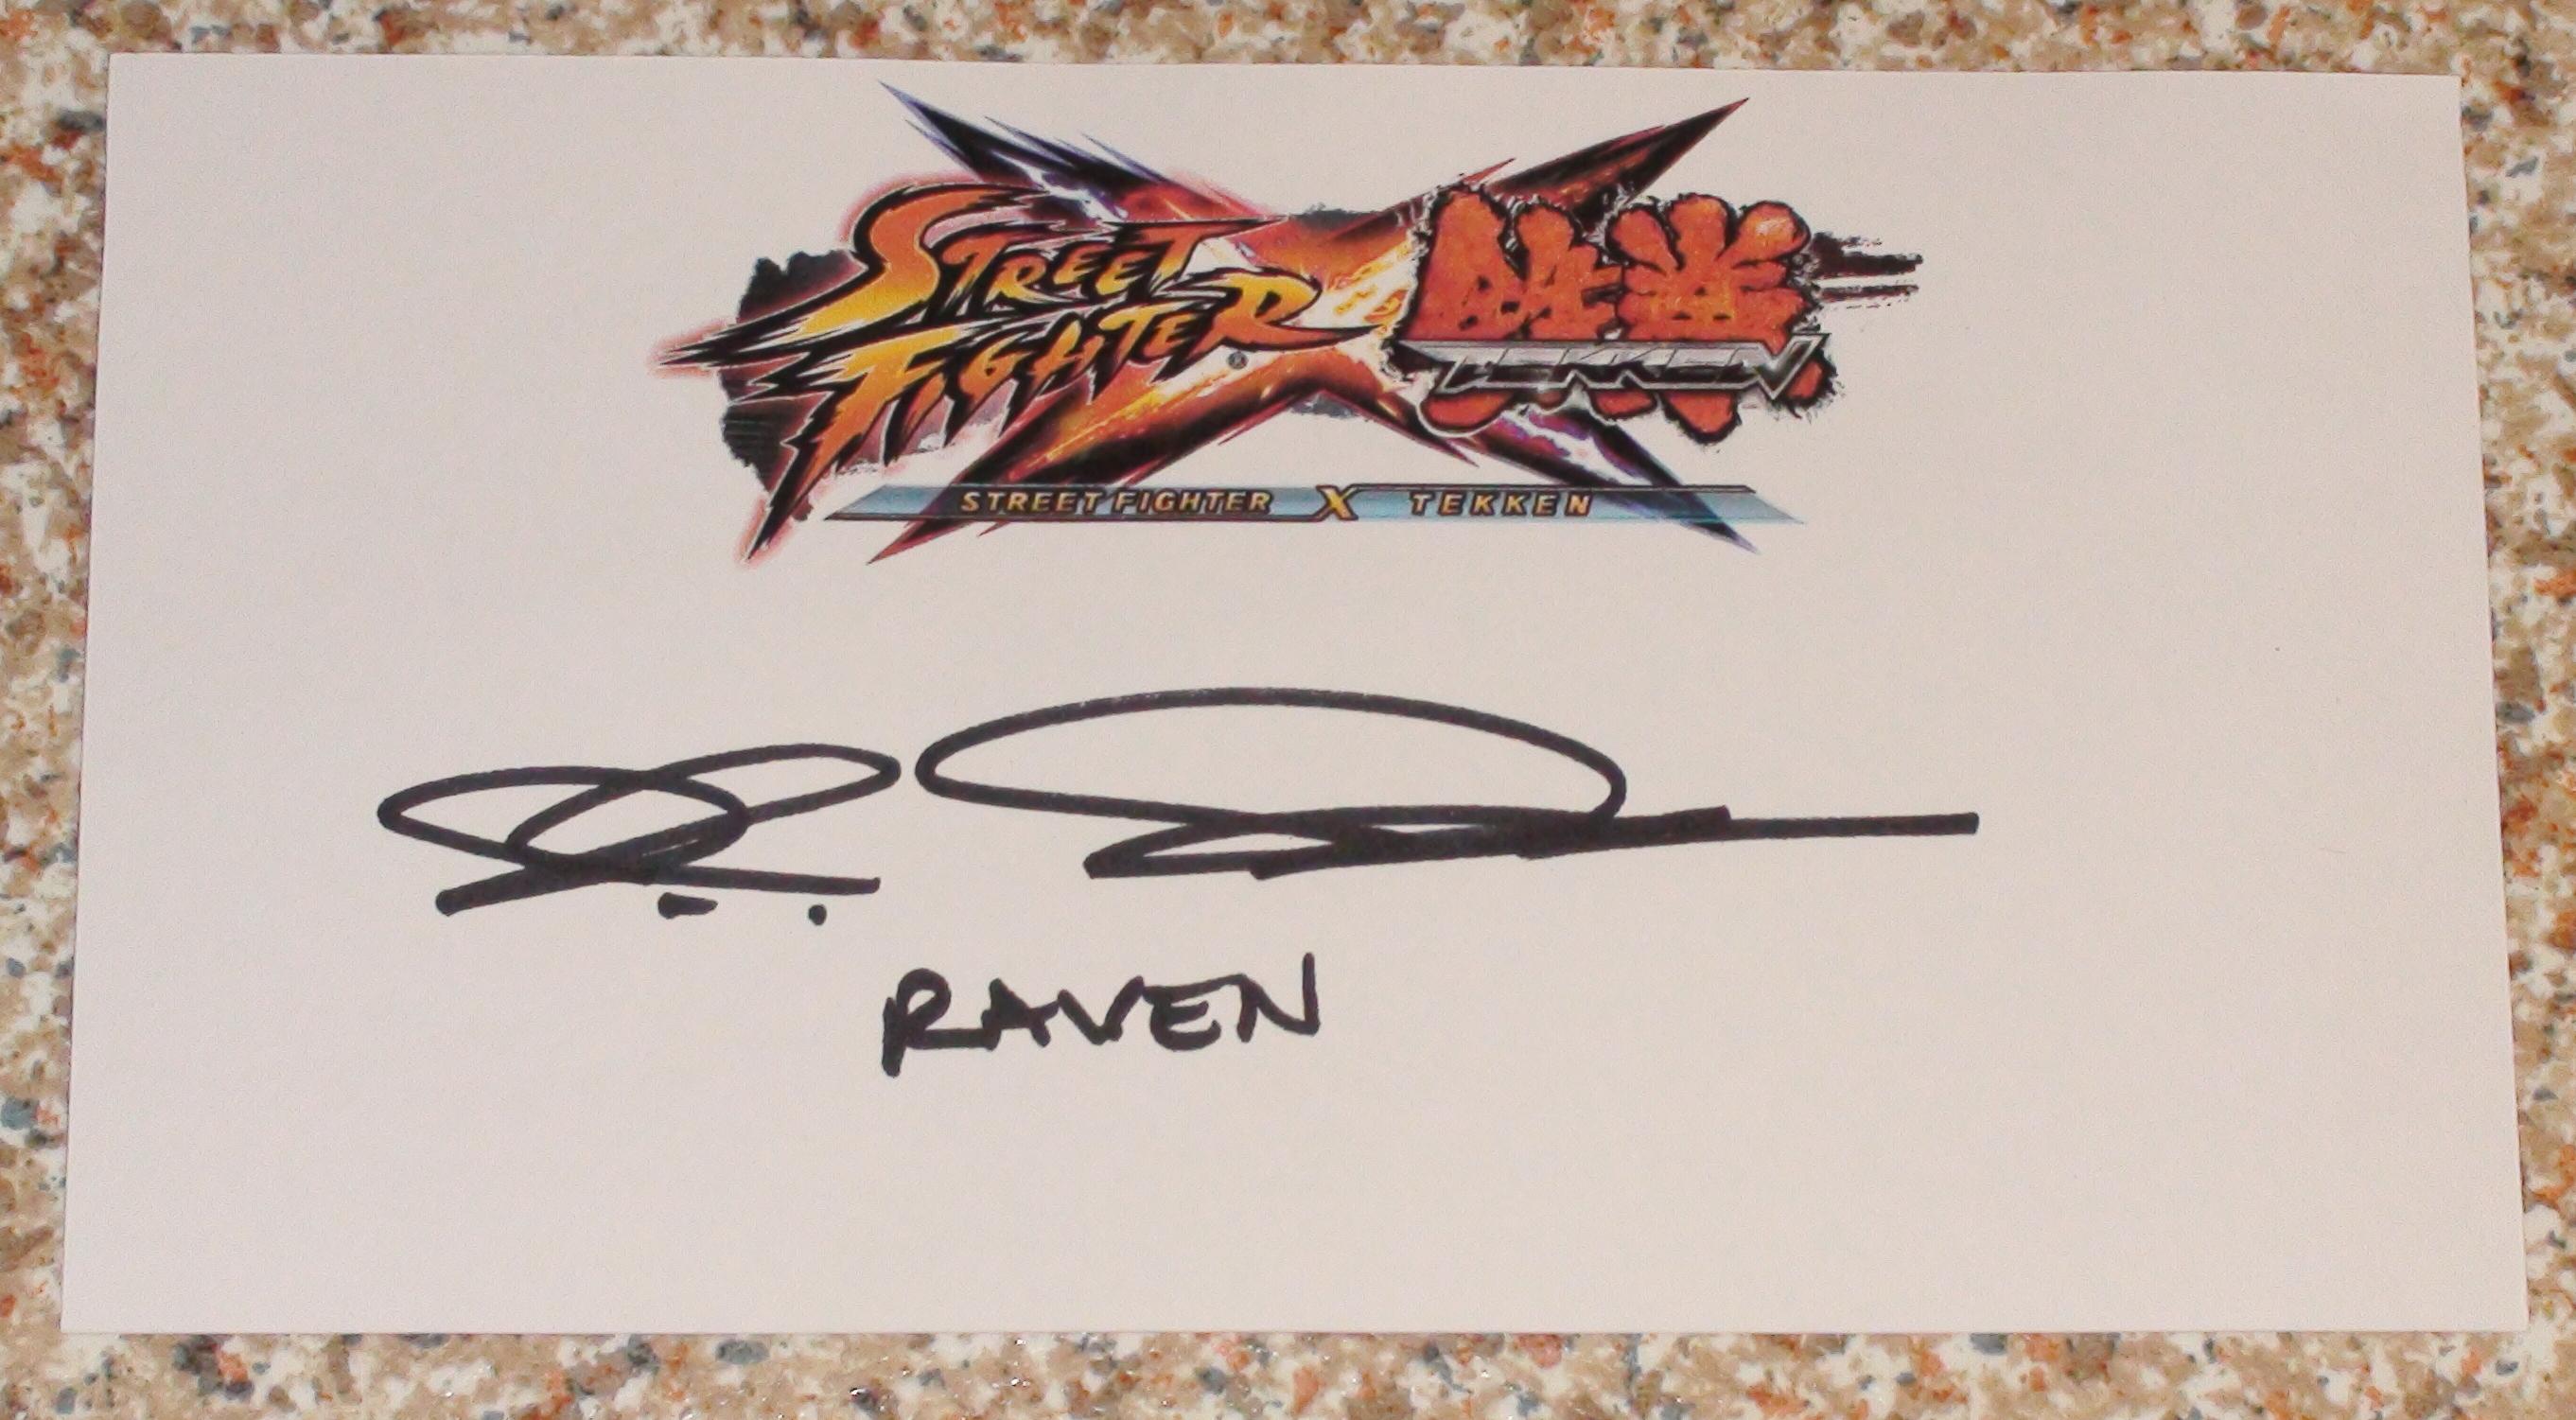 Street Fighter x Tekken - Douglas